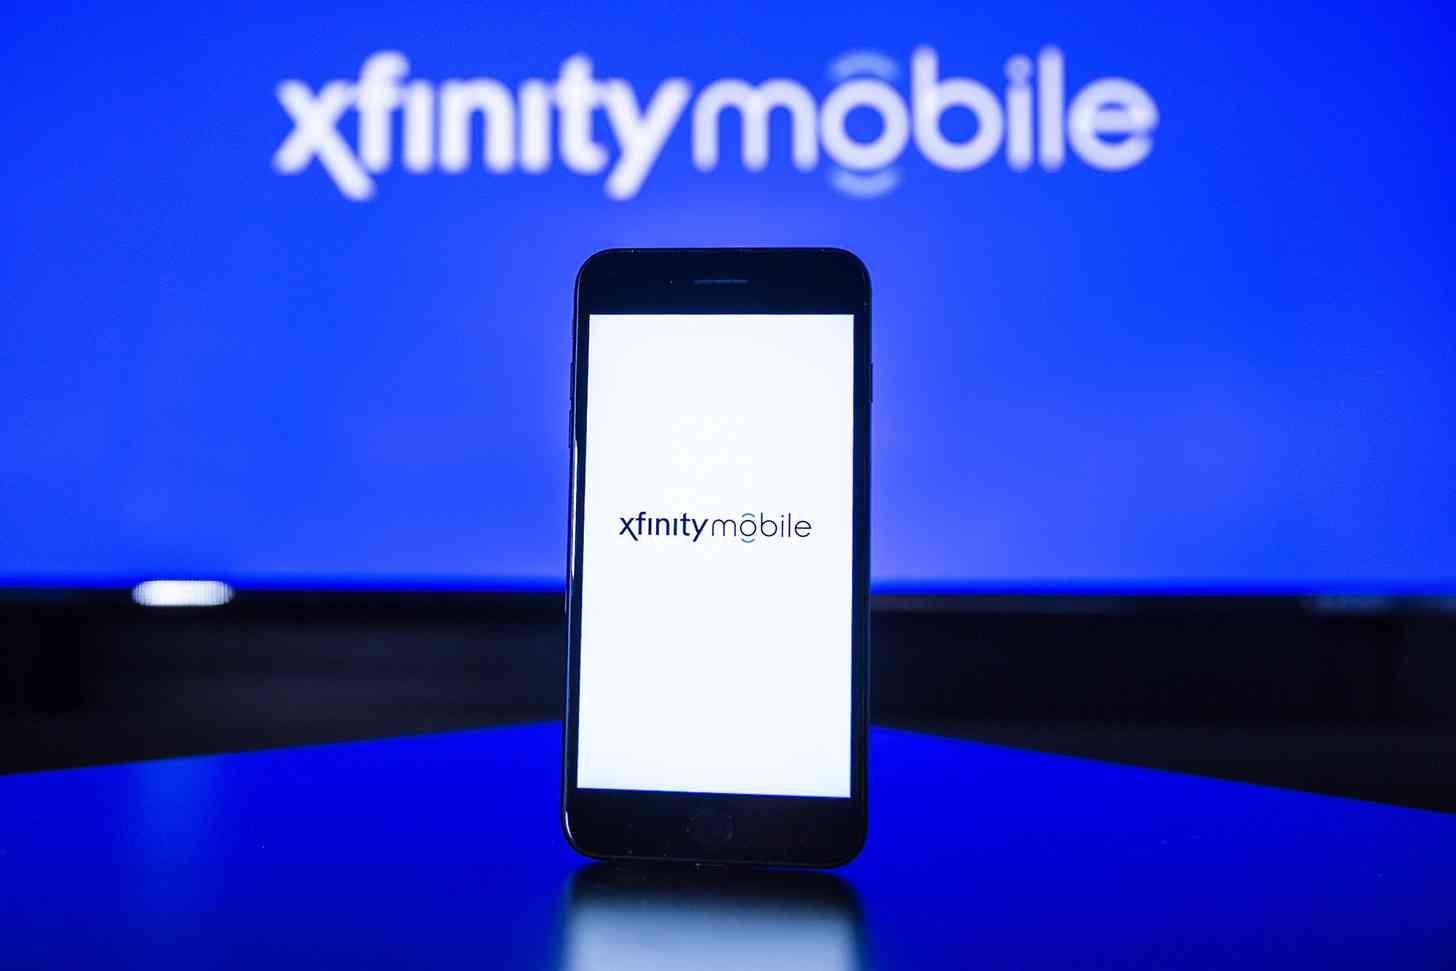 Xfinity Mobile official logo